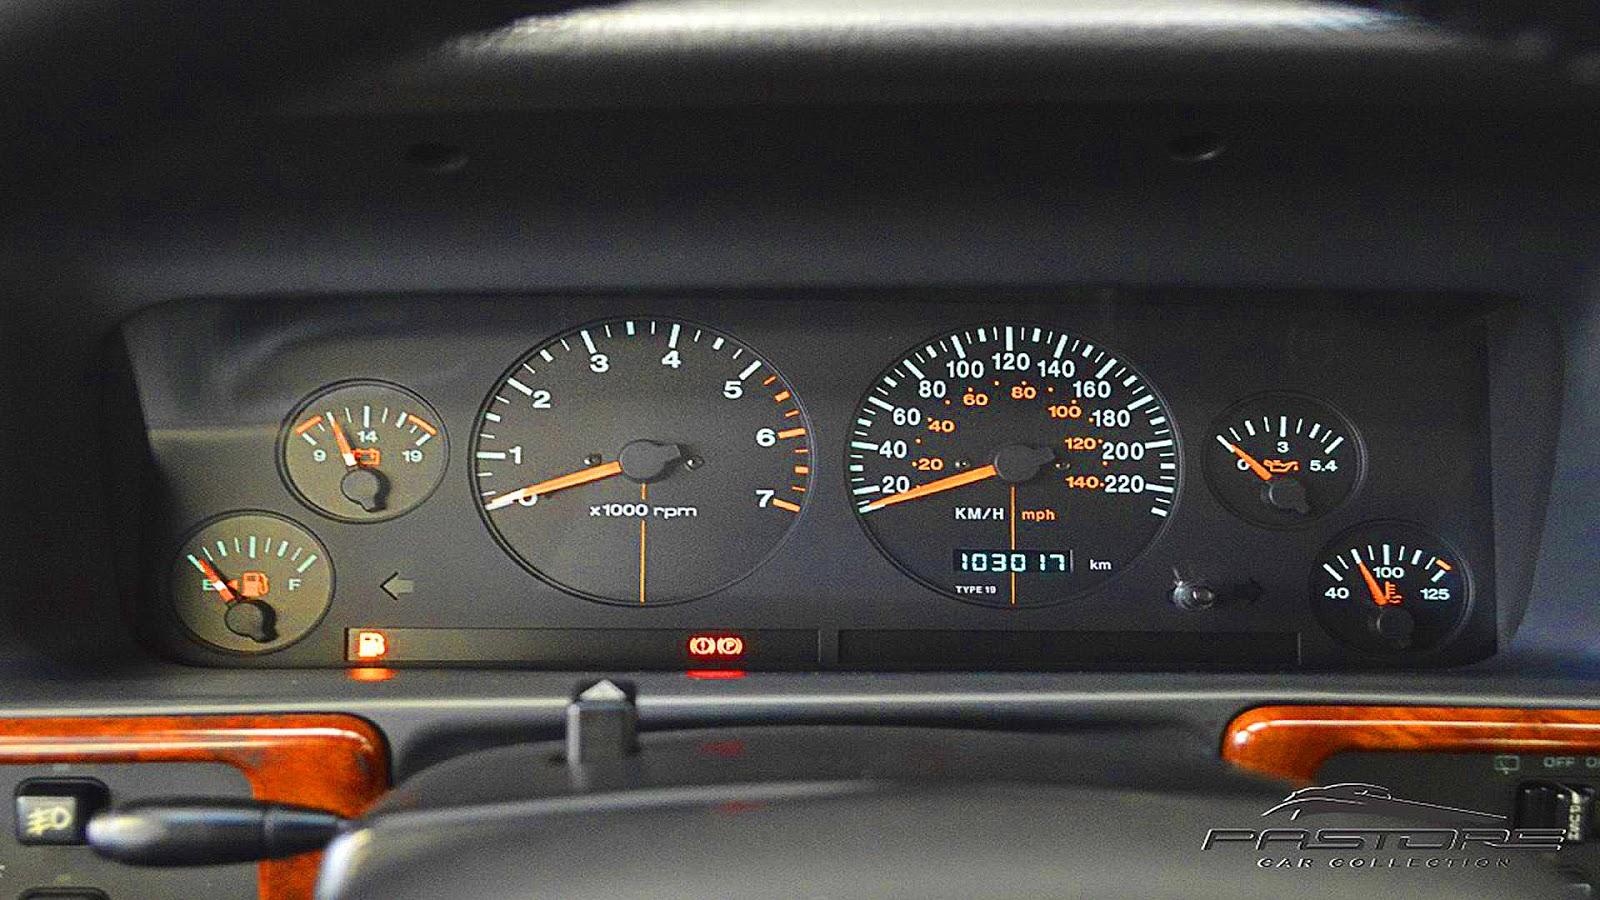 Pastore jeep grand cherokee limited 1998 prata aro 16 at4 4x4 52 v8 ltima reviso carimbada em 23042015 com 102066km fandeluxe Gallery